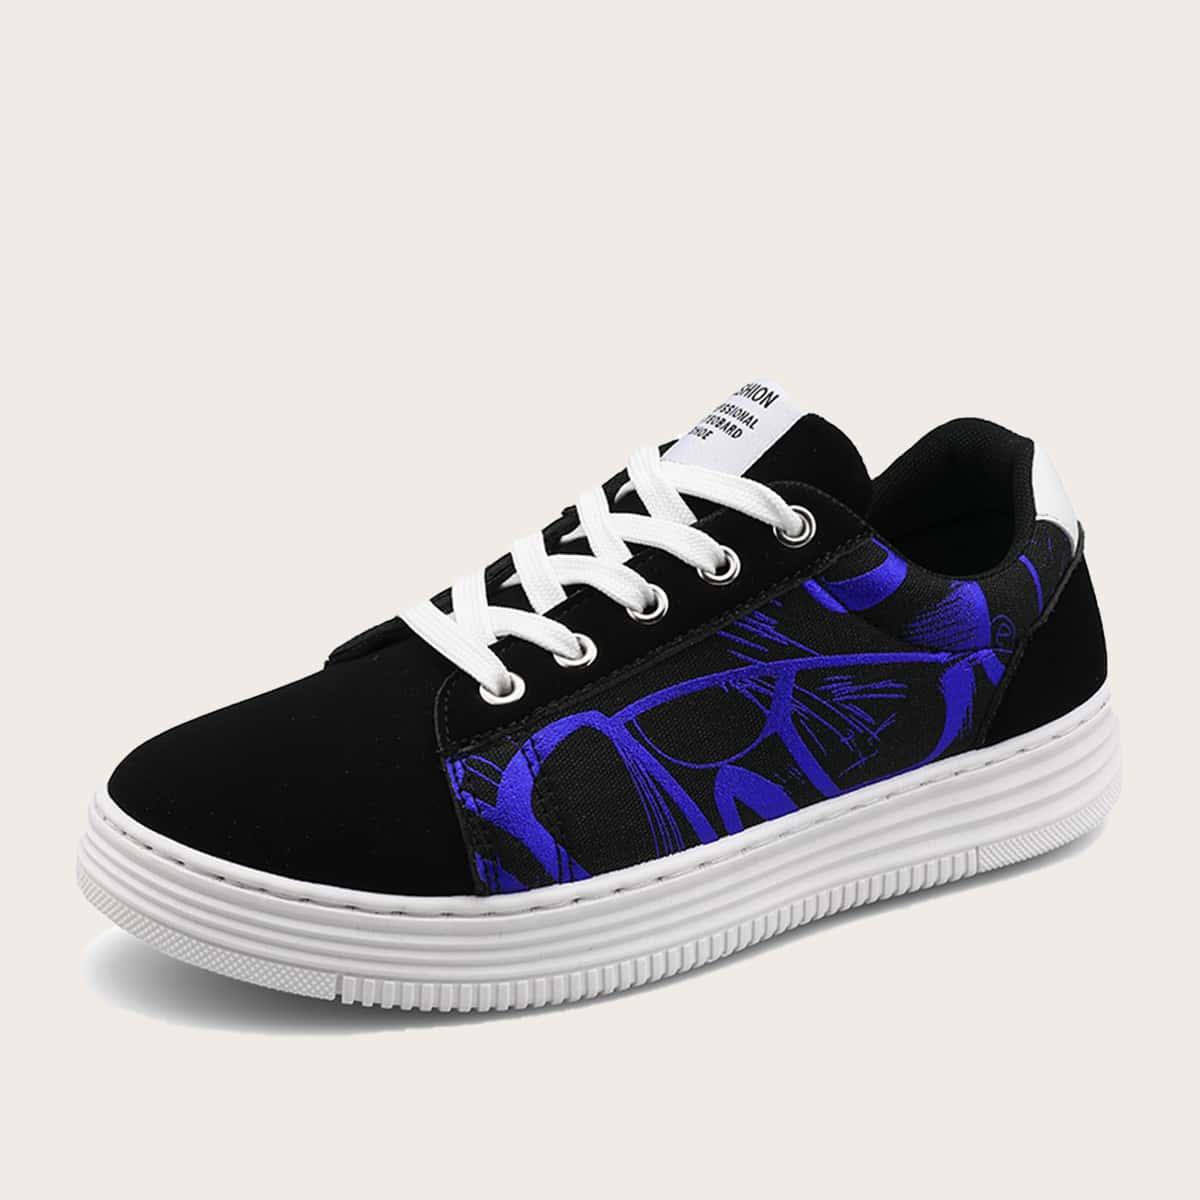 Обувь для скейтбординга на шнурках для мальчиков